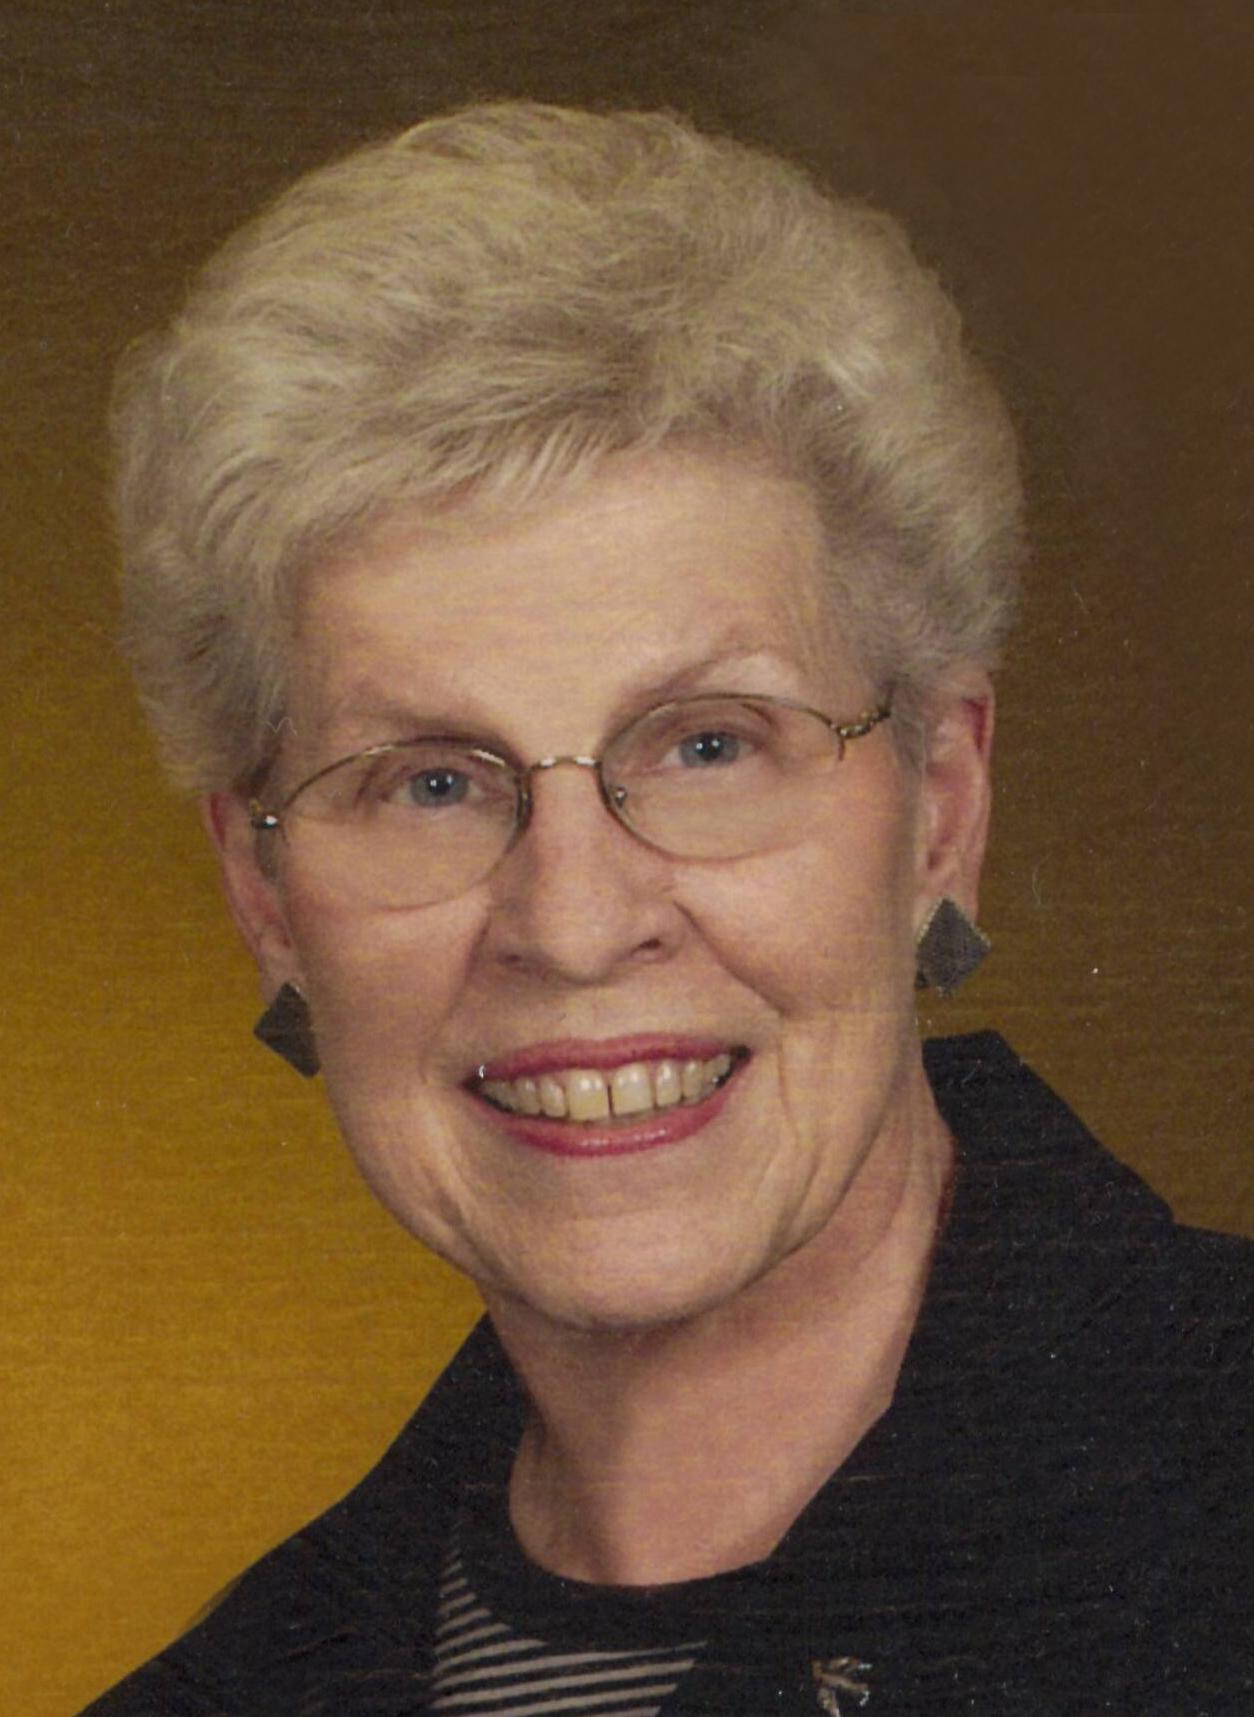 Kathryn Ann Barker, age 83 of Holdrege